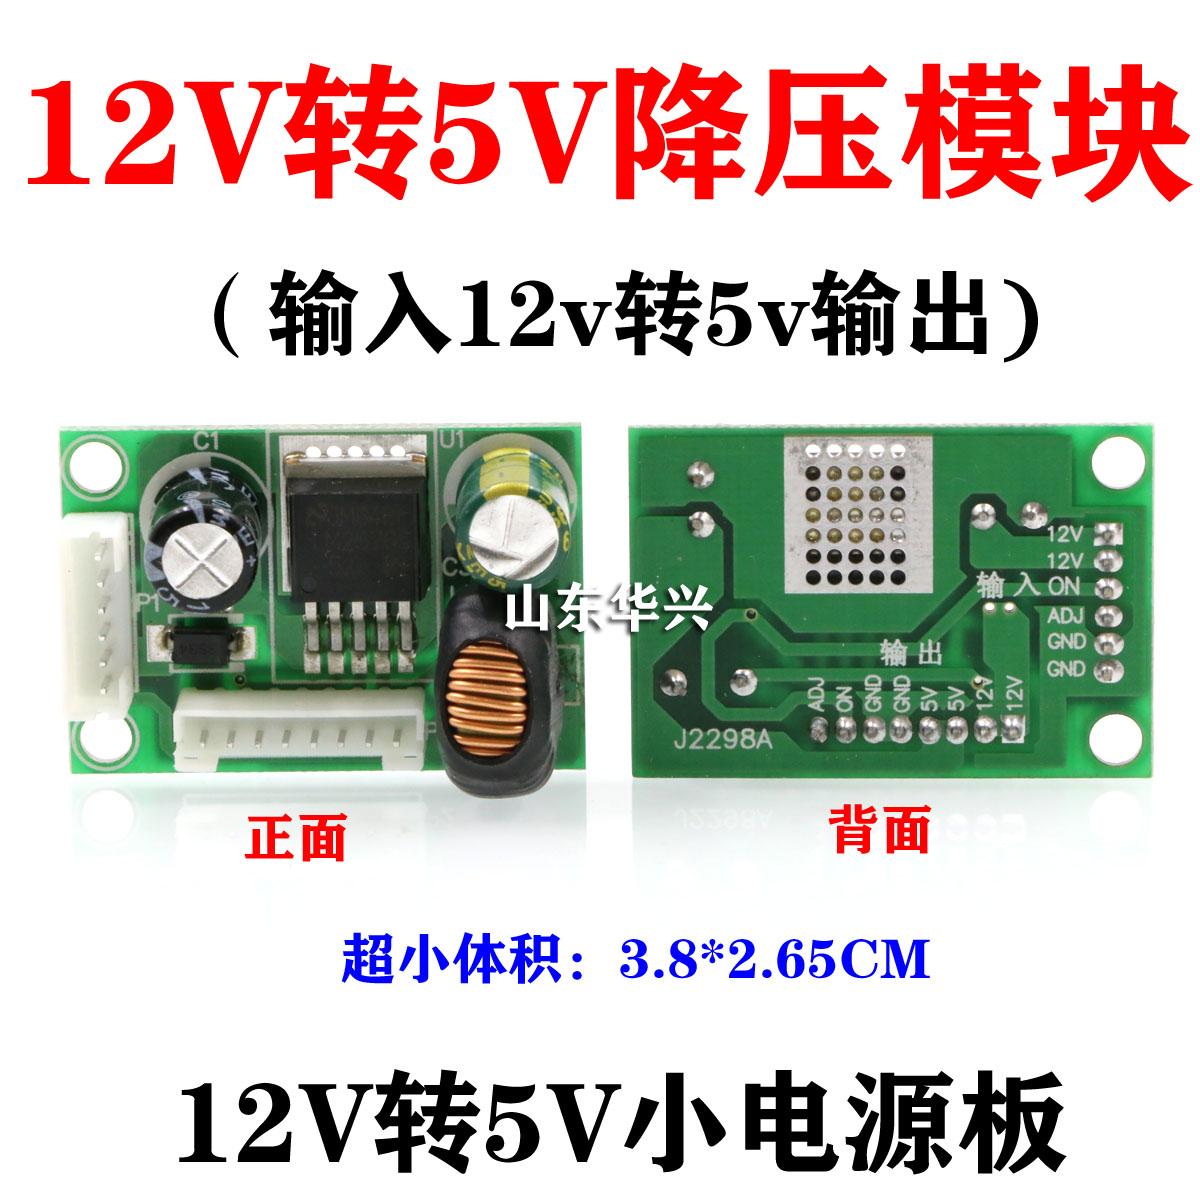 12v转5v降压模块超小液晶电源板12v输入转5v输出电源降压模块板